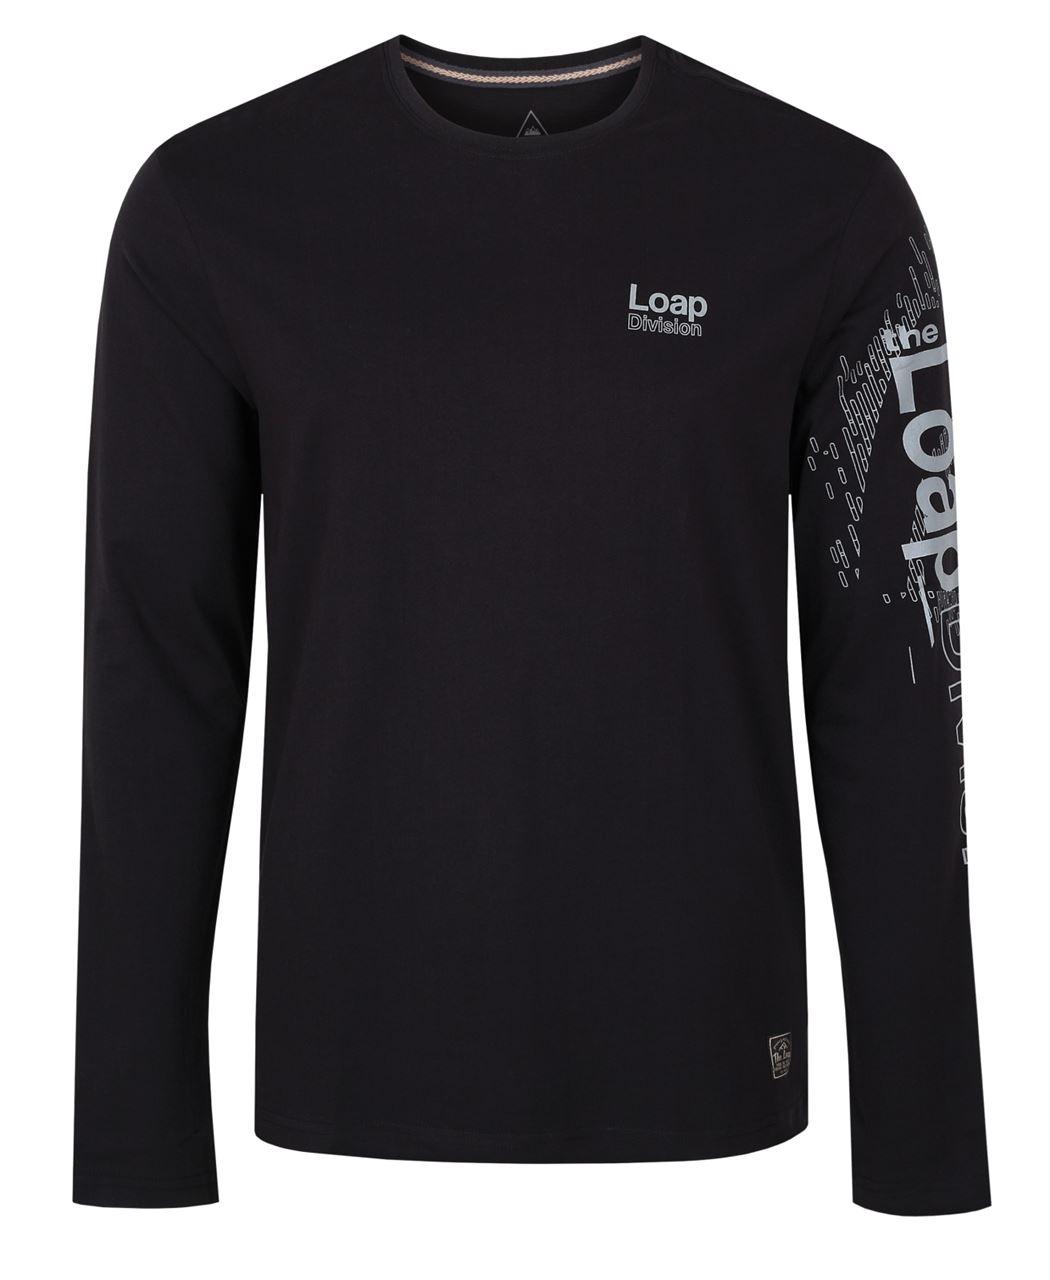 Pánské triko/dlouhý rukáv BAHU černá